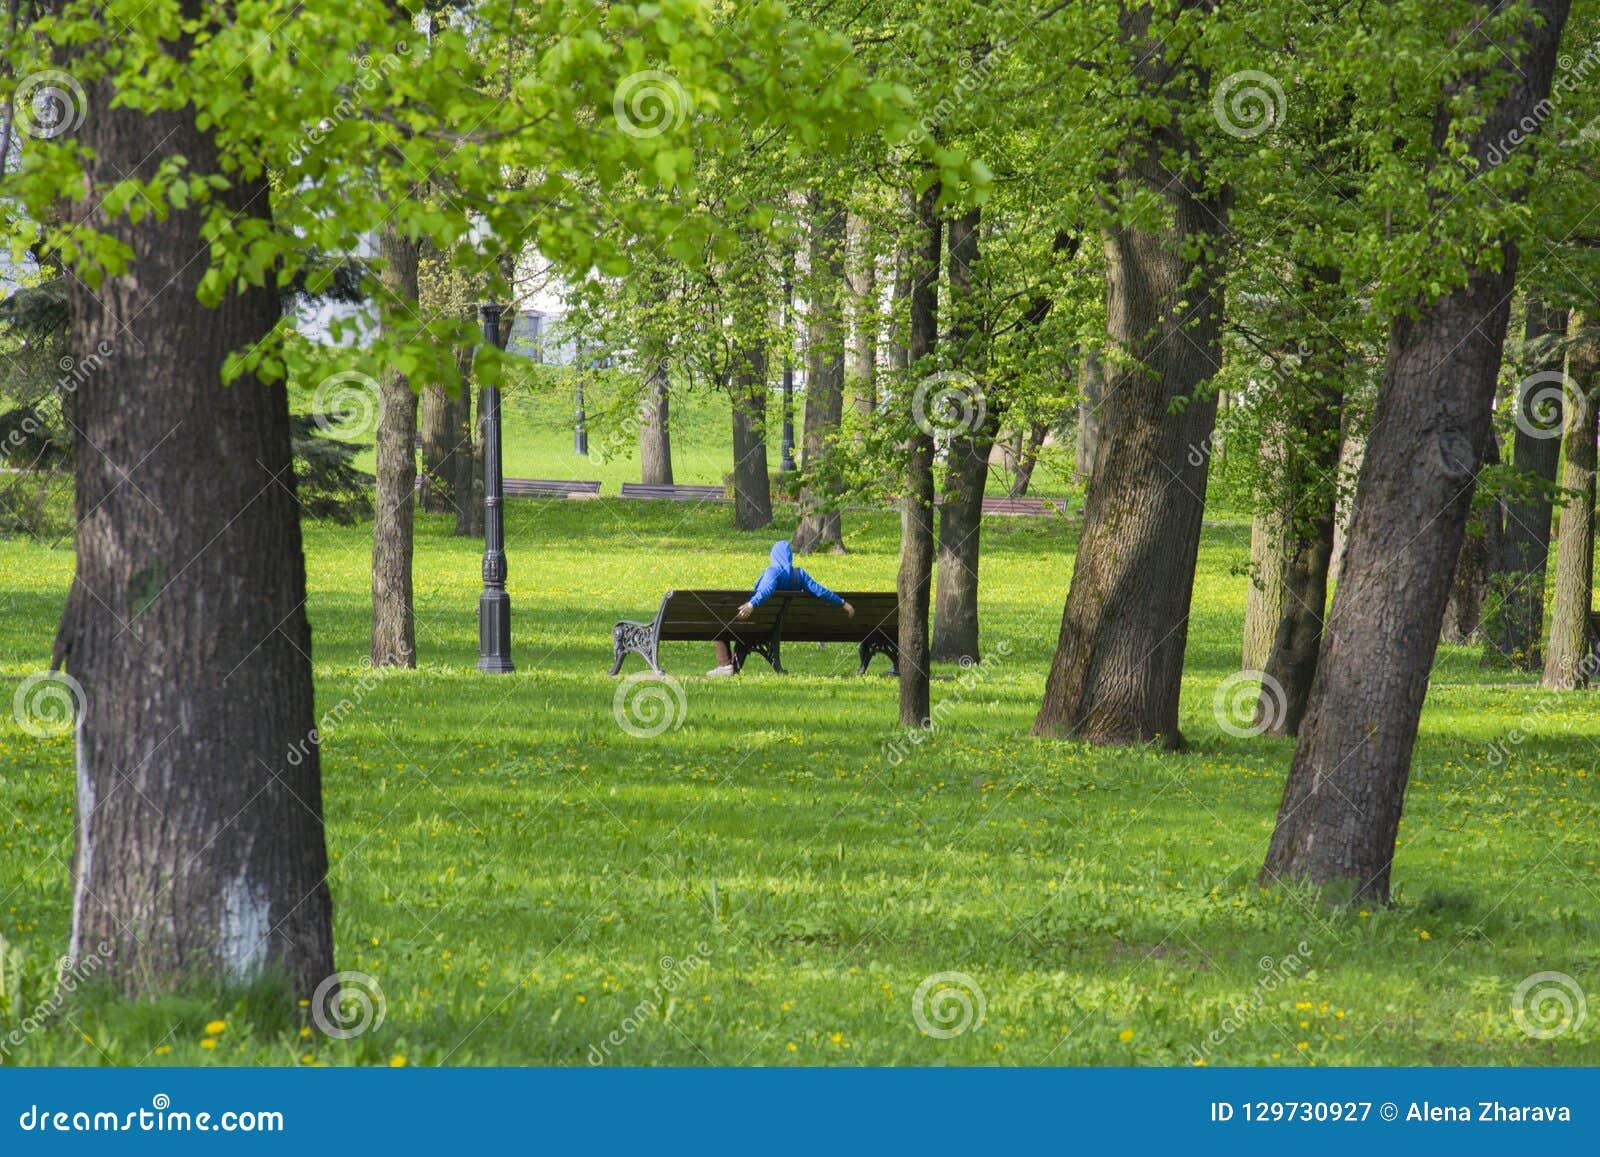 rest in the park on a bench in Minsk, Belarus